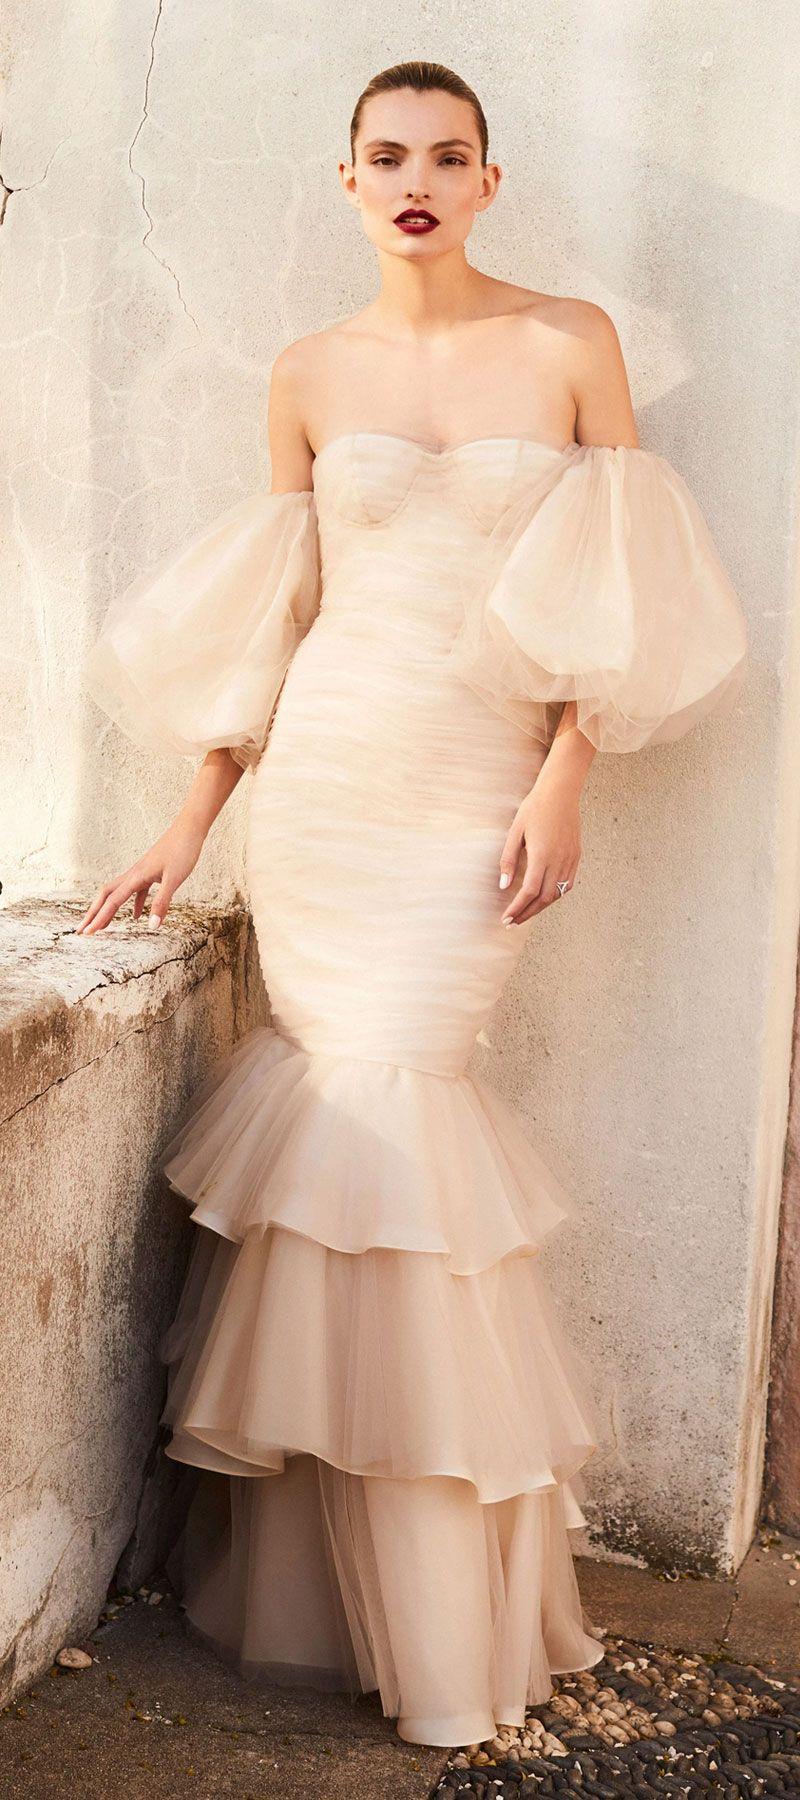 Johanna Ortiz Wedding Dress off-the-shoulder neckline, puff sleeves mermaid wedding gown silk crepe de chine #wedding #weddings #weddinggown